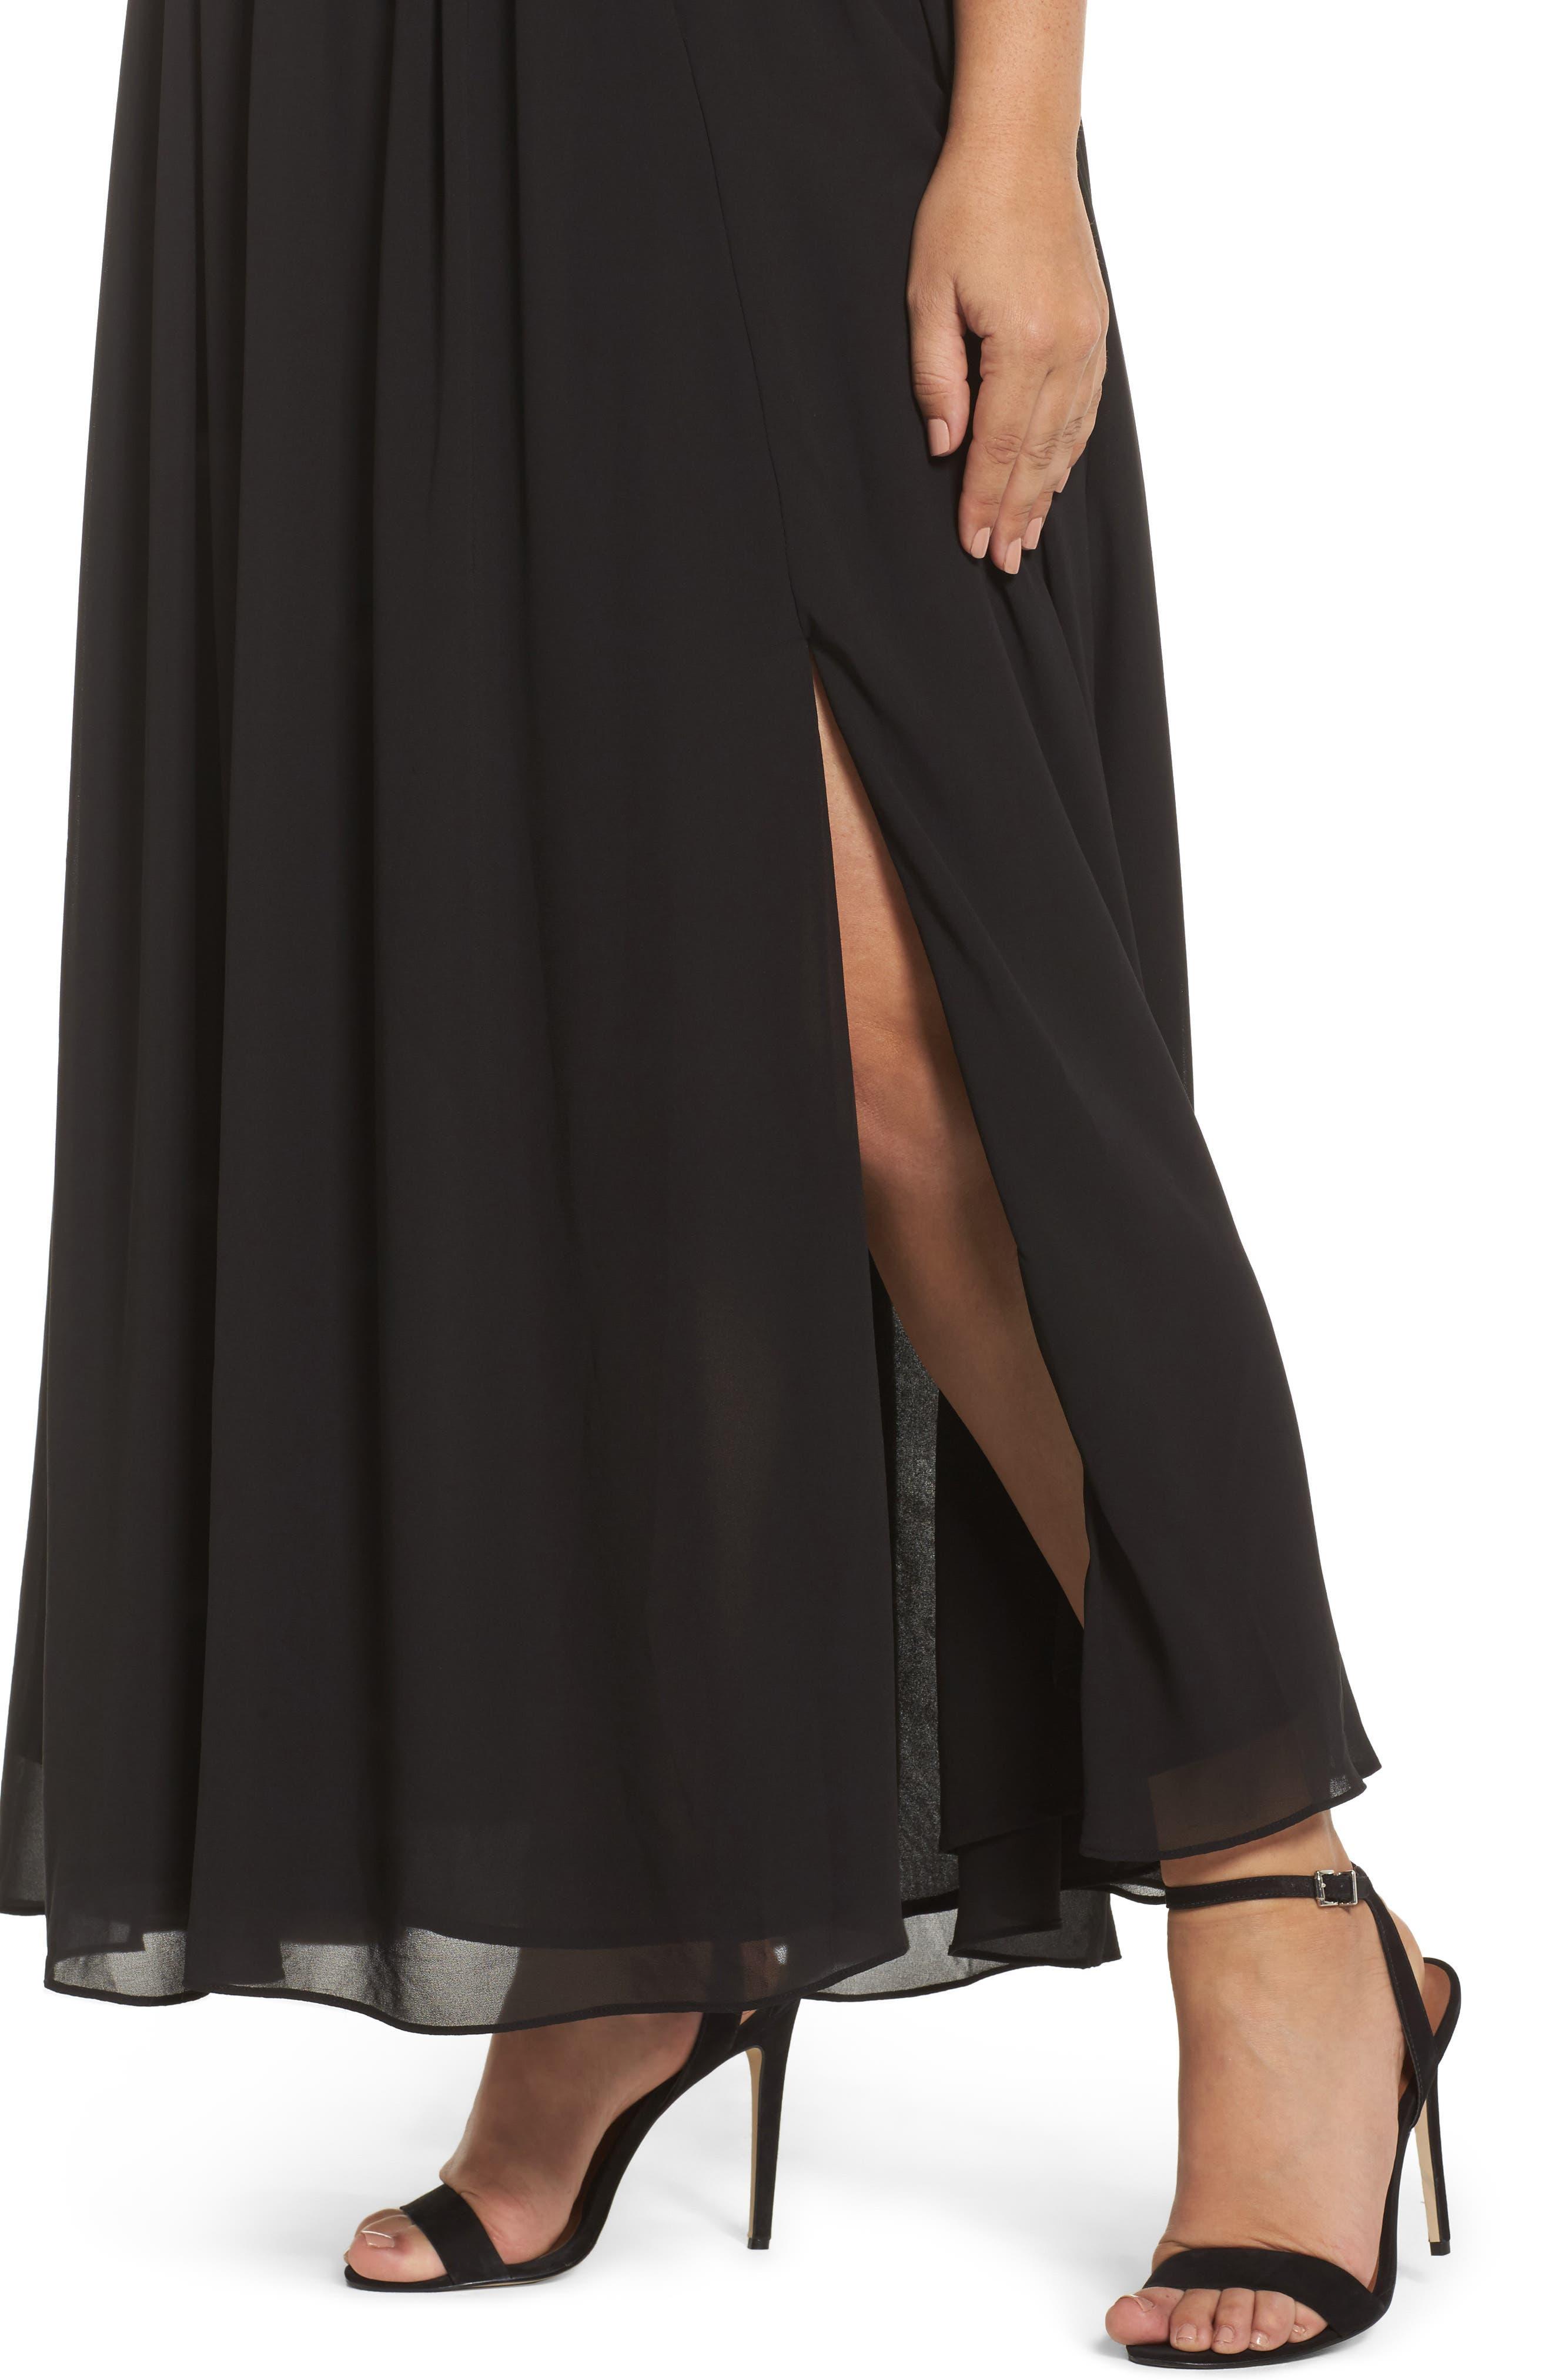 Lace Inset Maxi Dress,                             Alternate thumbnail 4, color,                             Black